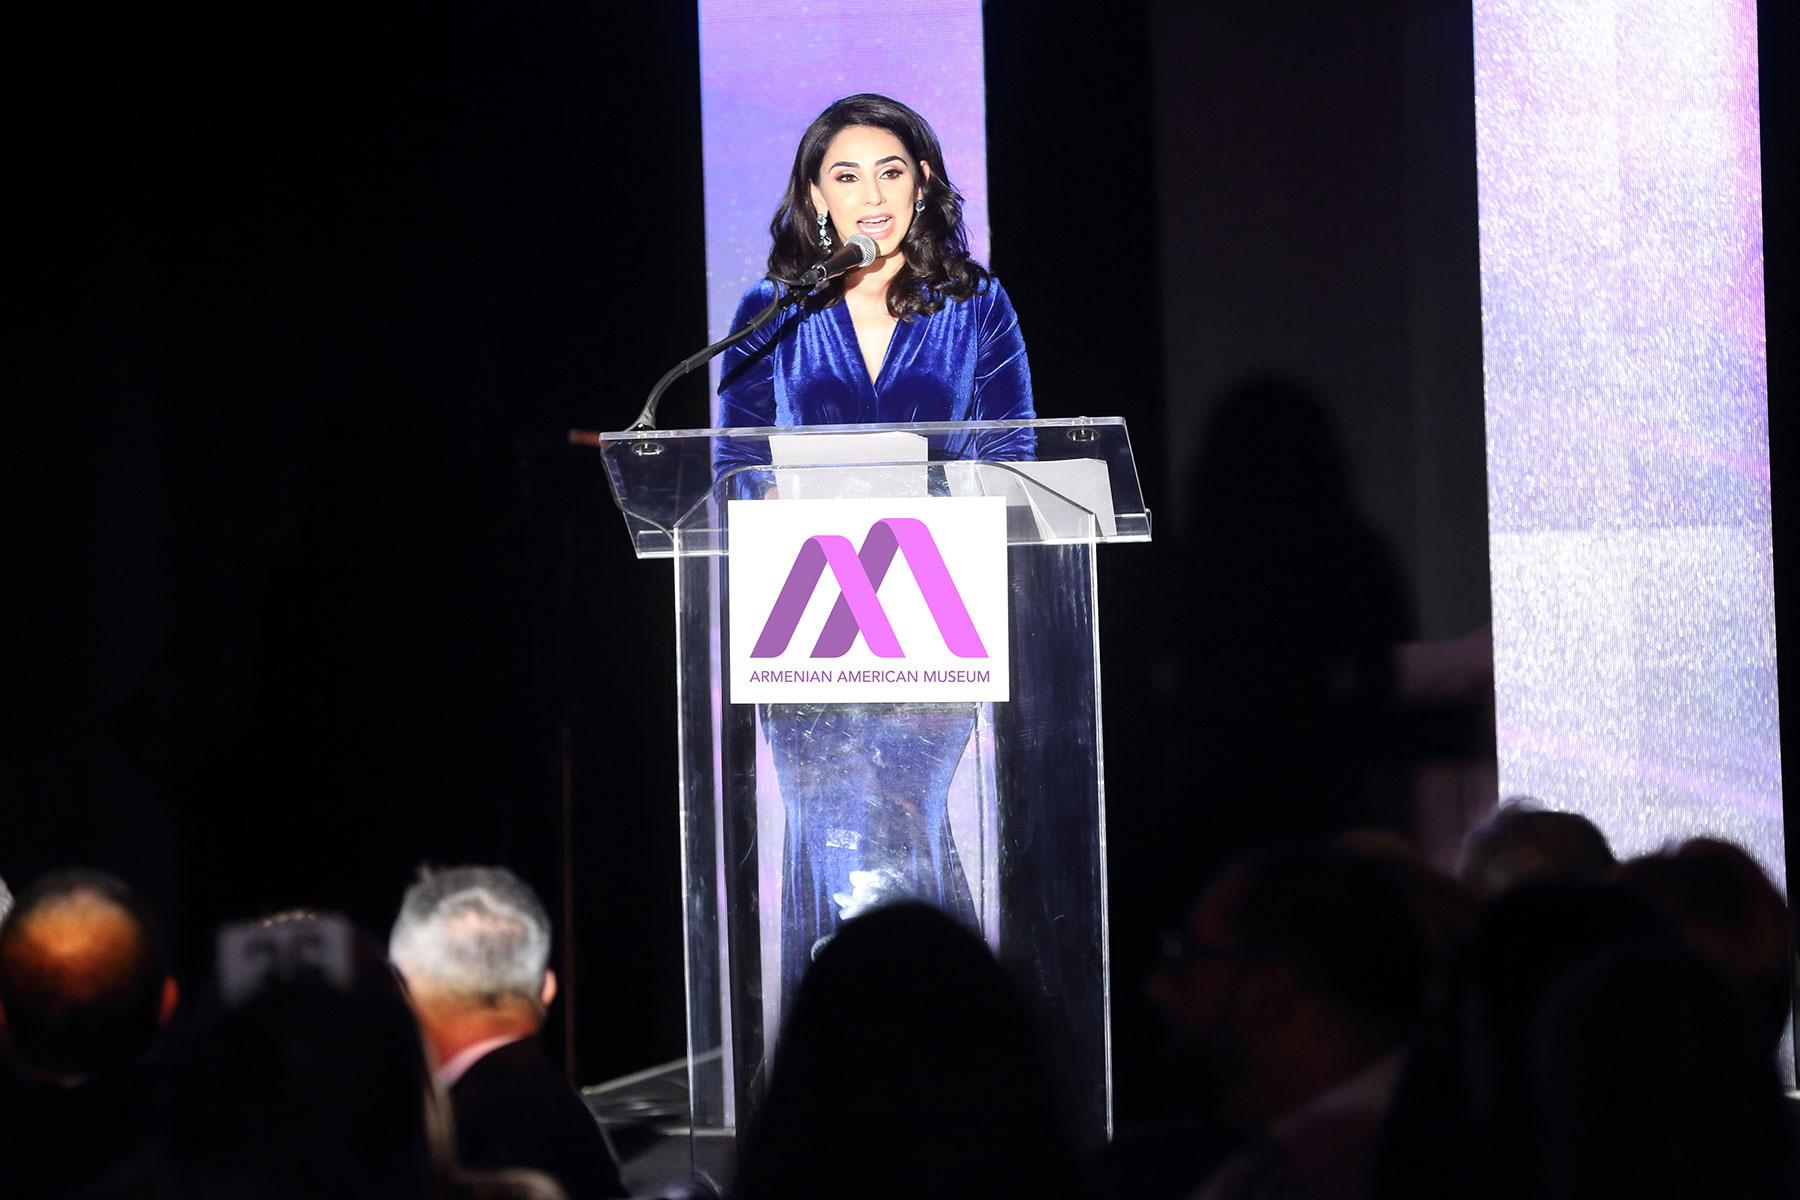 Armenian American Museum Inaugural Gala Master of Ceremonies Araksya Karapetyan